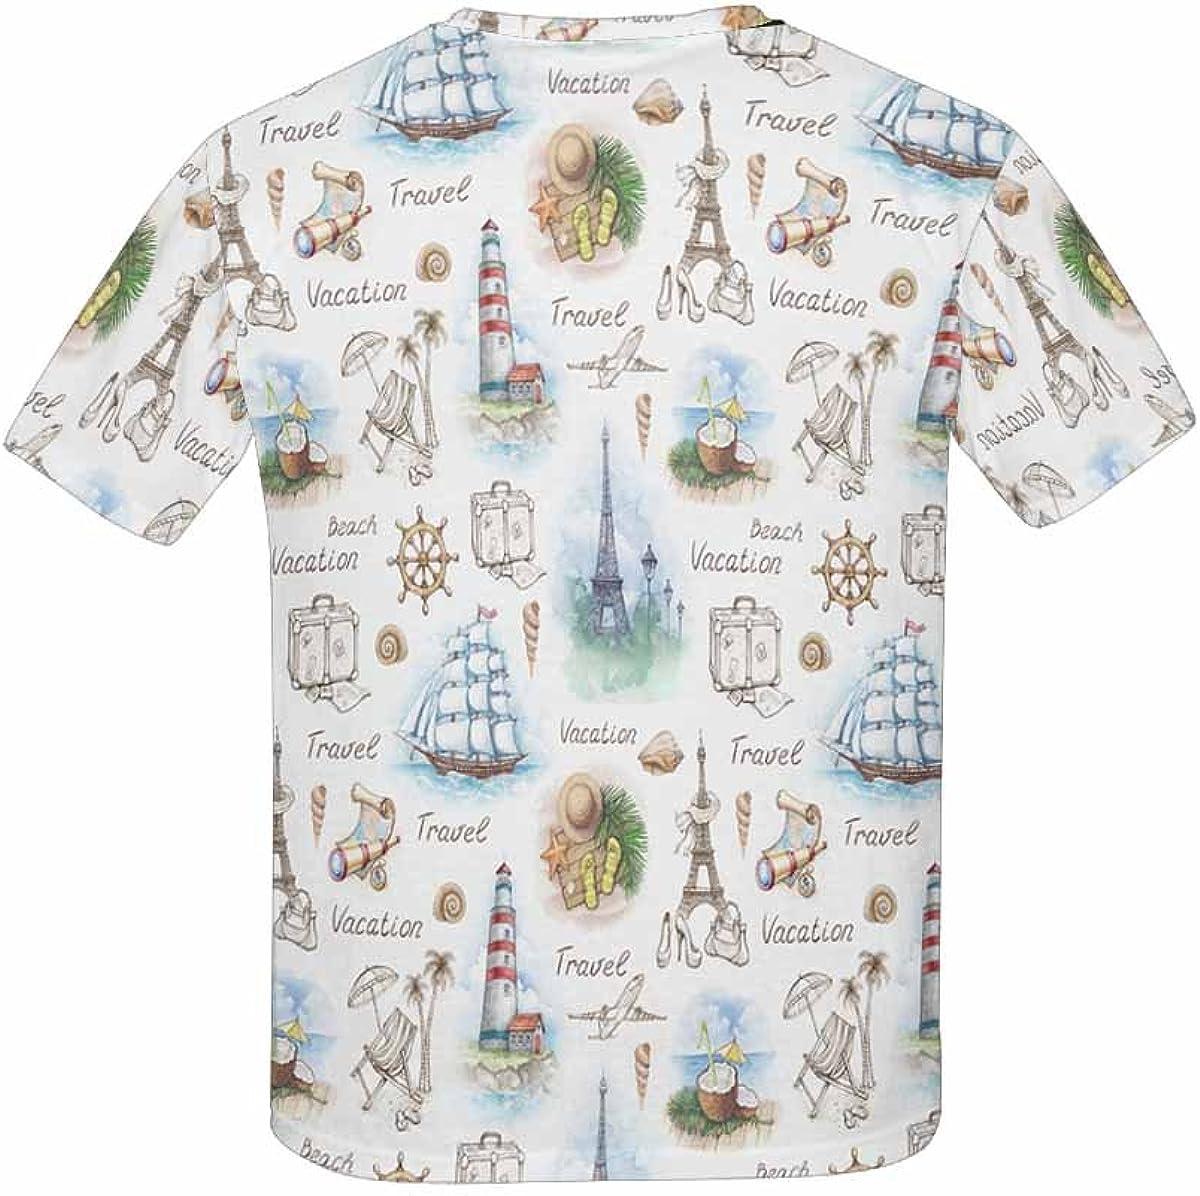 XS-XL INTERESTPRINT Childs T-Shirt Travels Pattern